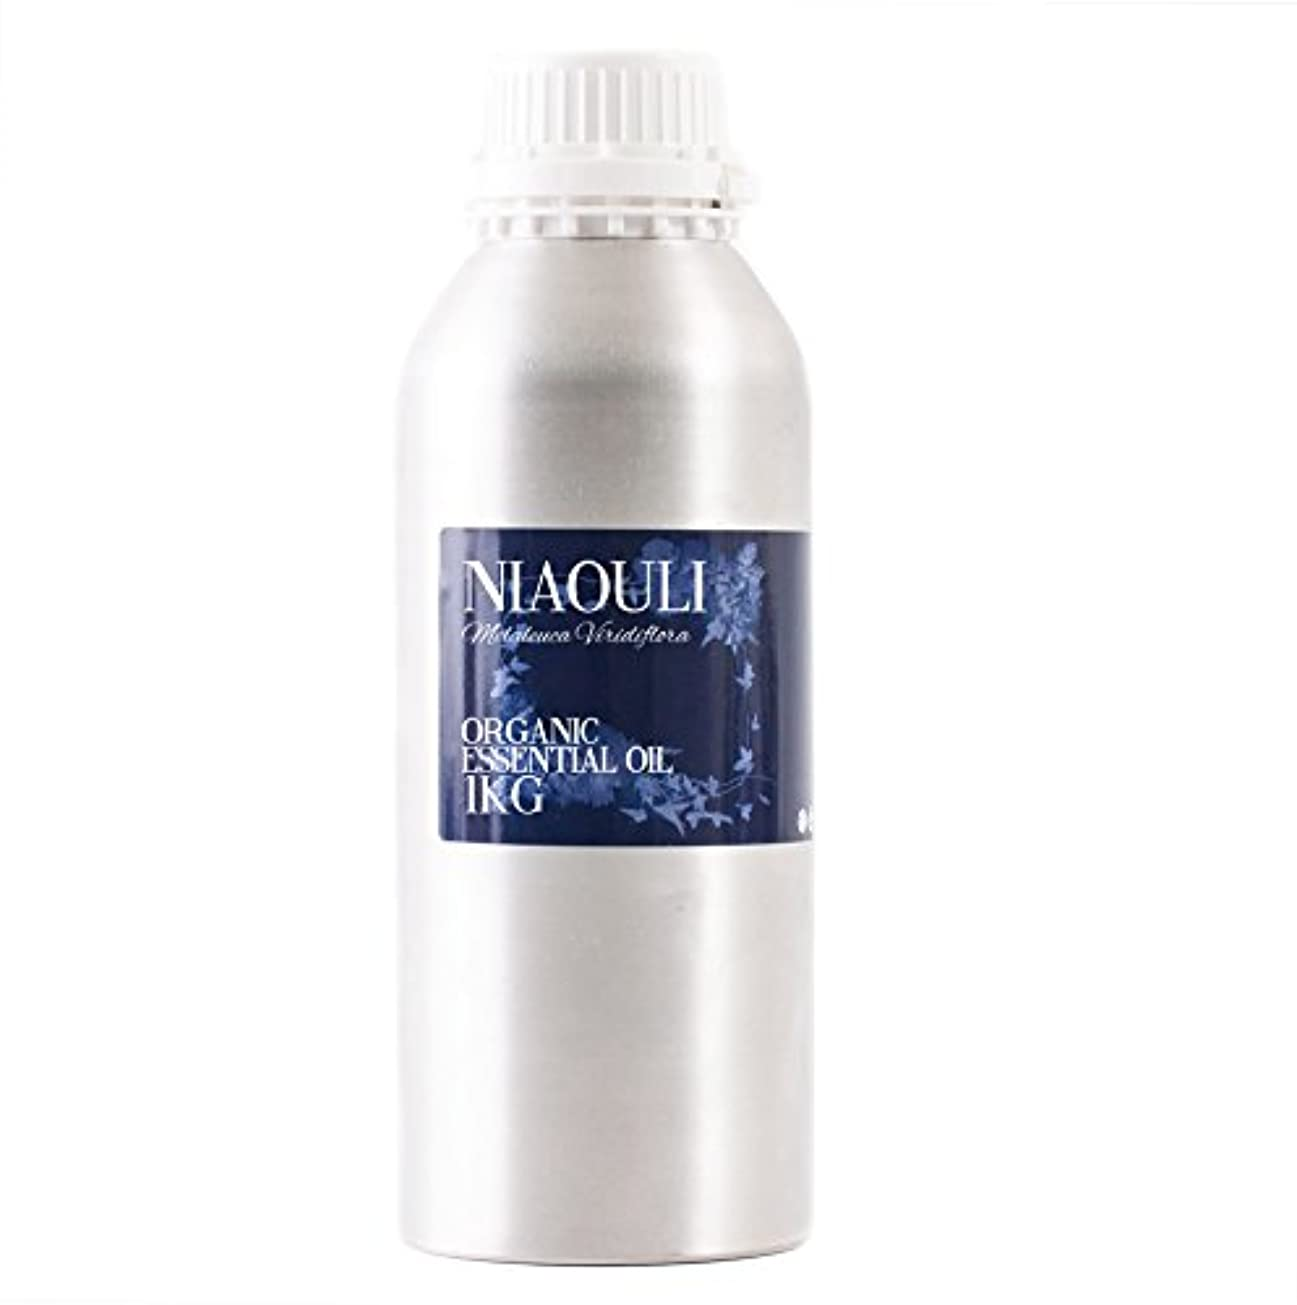 Mystic Moments | Niaouli Organic Essential Oil - 1Kg - 100% Pure